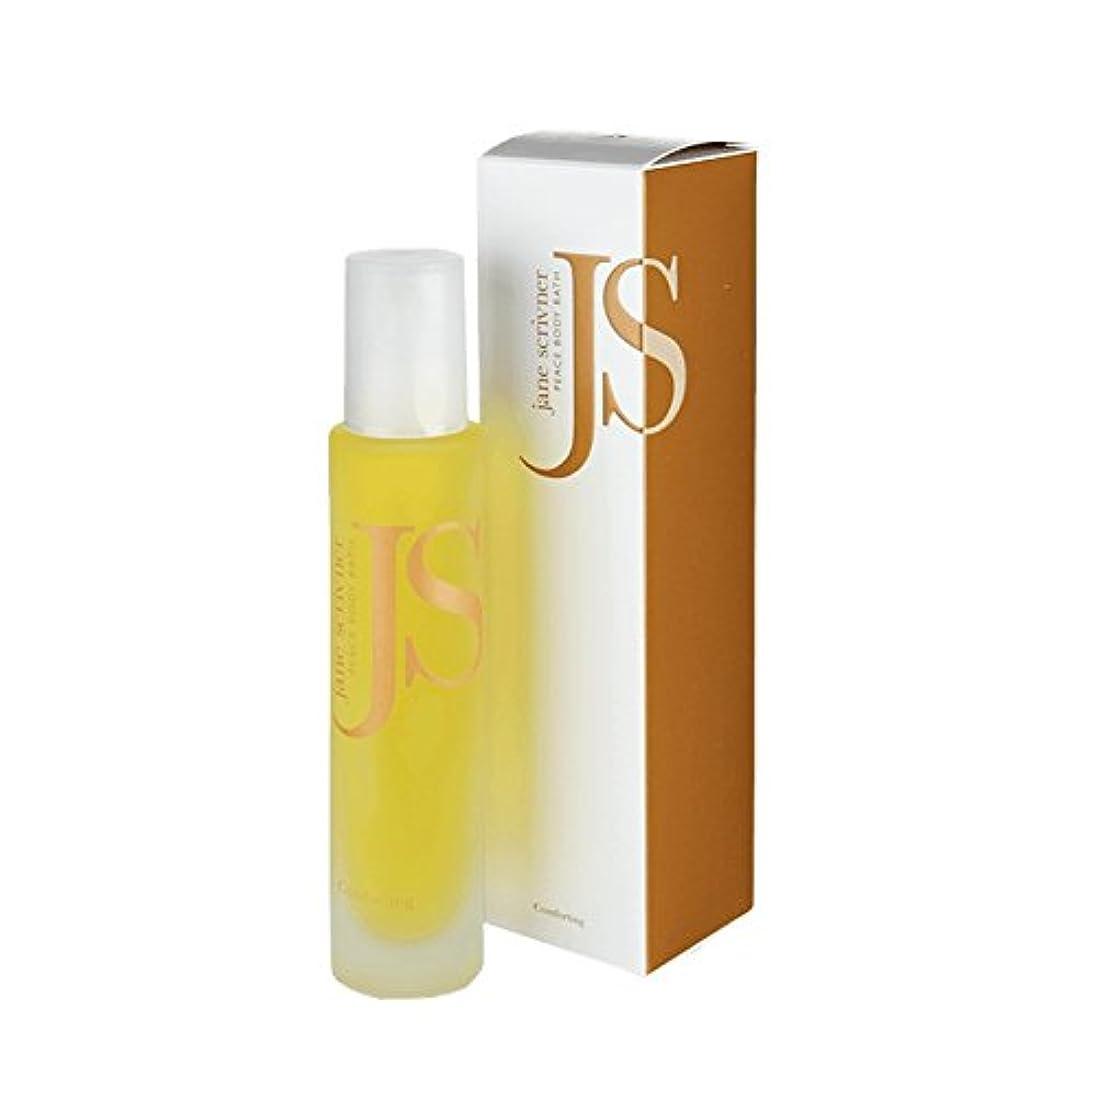 Jane Scrivner Body Bath Oil Peace 100ml (Pack of 2) - ジェーンScrivnerボディバスオイル平和100ミリリットル (x2) [並行輸入品]